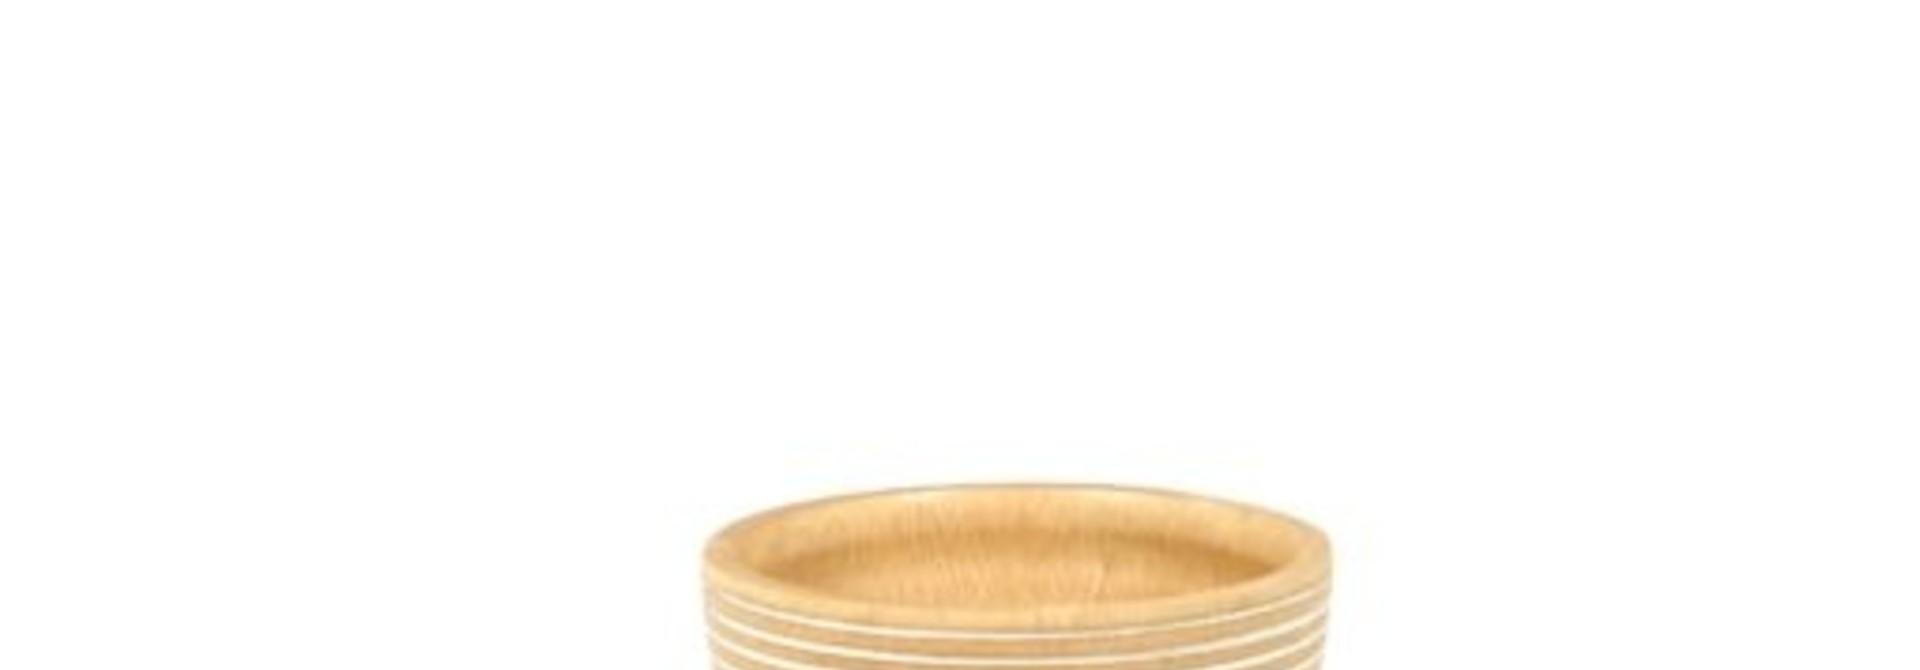 White Striped Mango Wood Bowl - Small